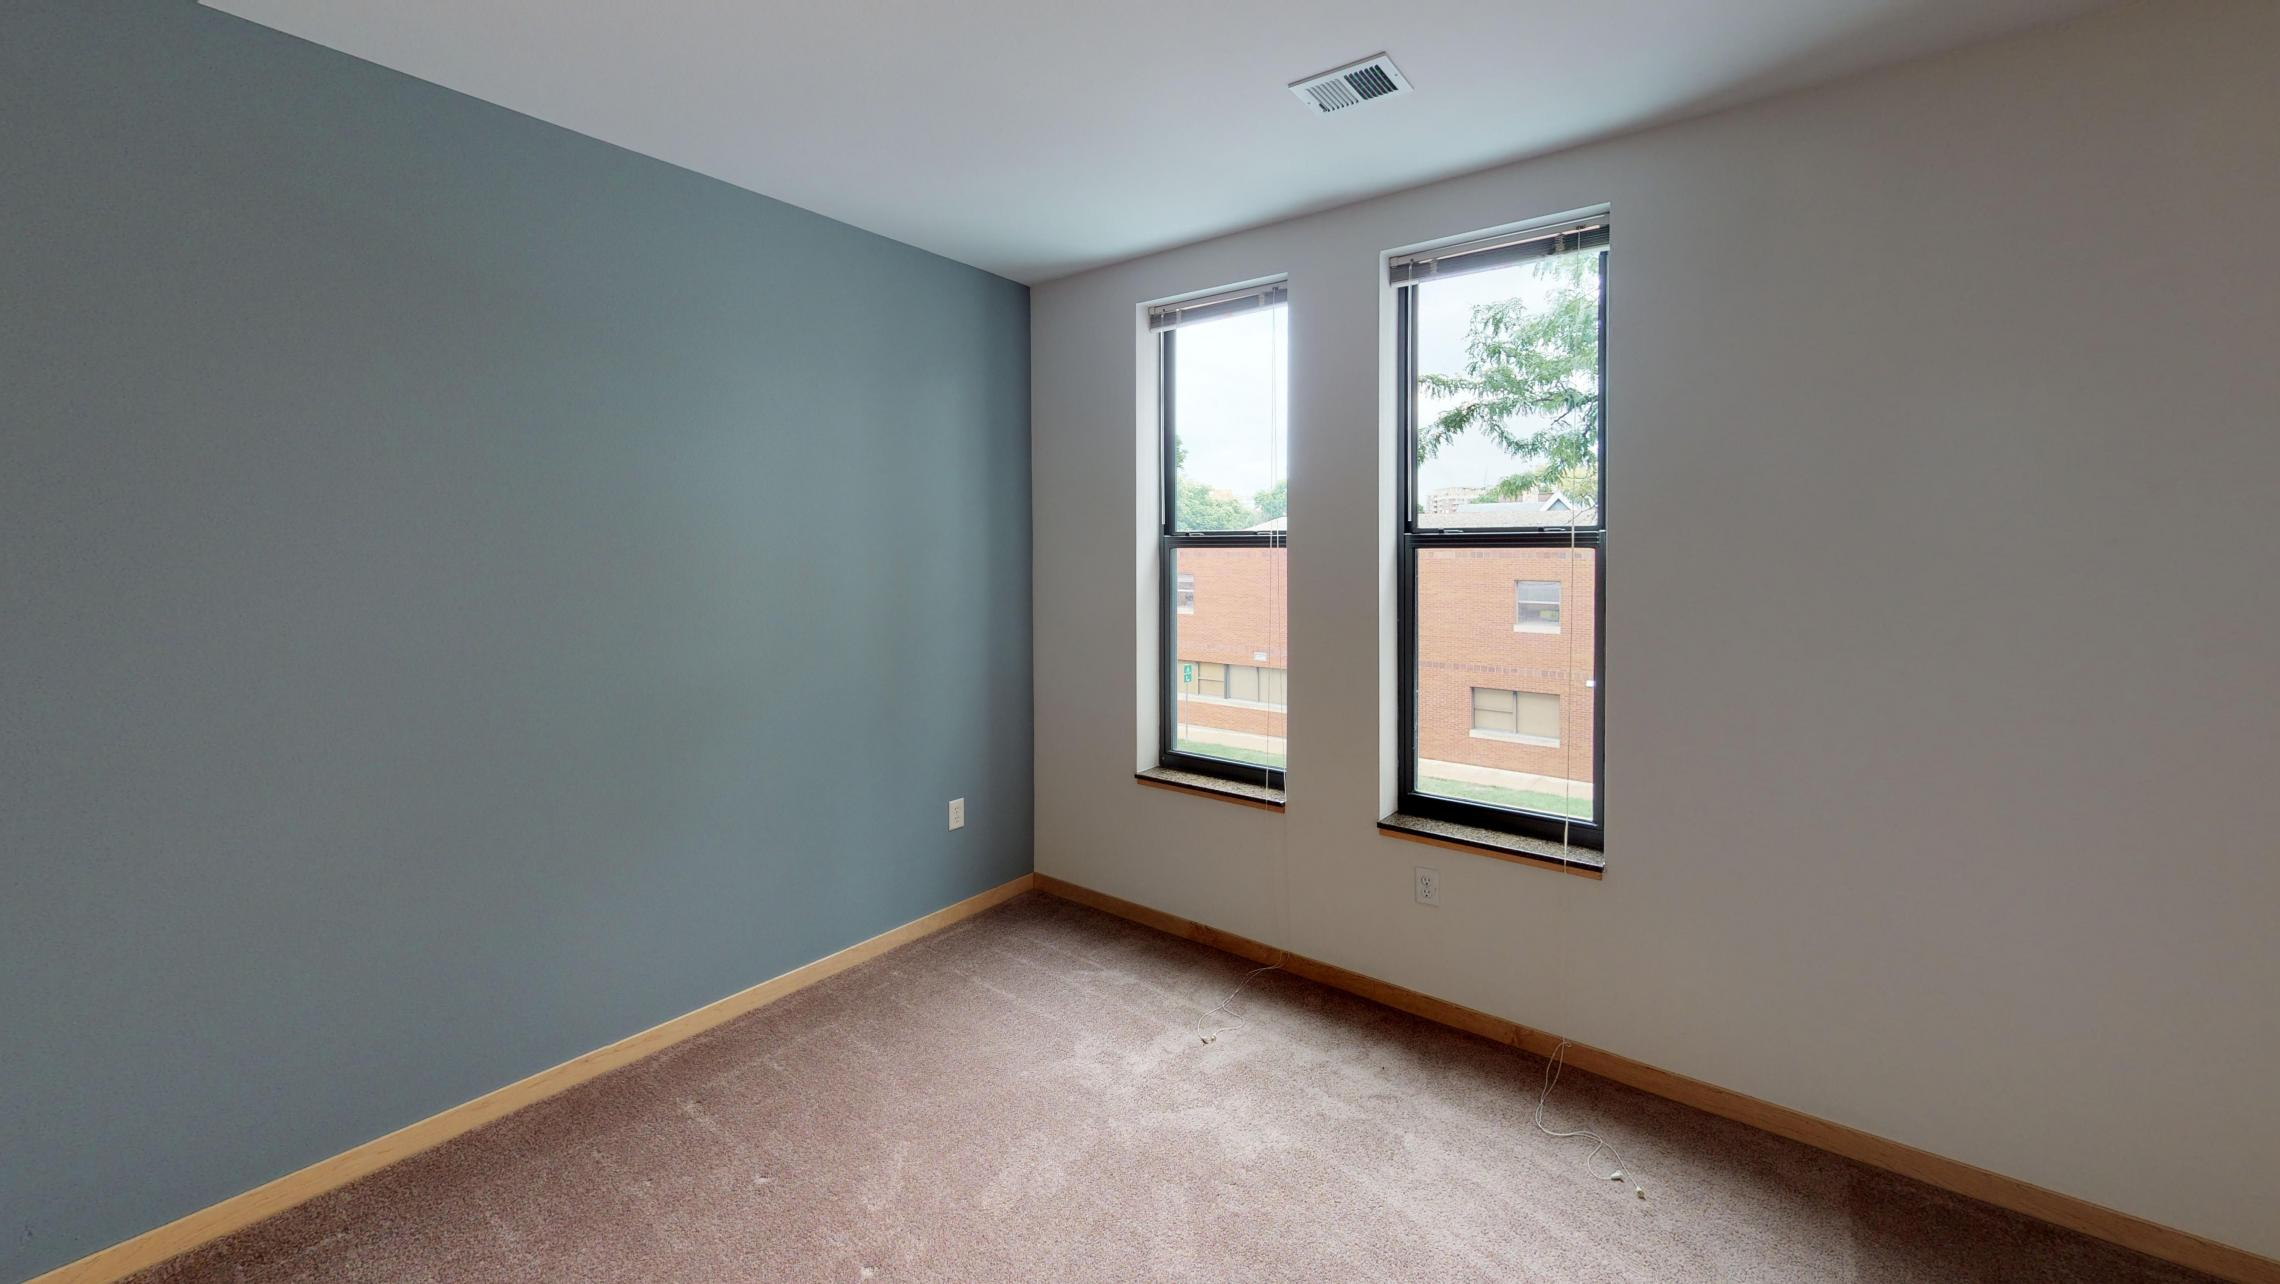 The-Depot-Apartments-Downtown-Madison-Lifestyle-Large-Closet-Bike-Storage-Washington-Ave-Style-Design-Balcony-Apartment-1-213-One-Bedroom